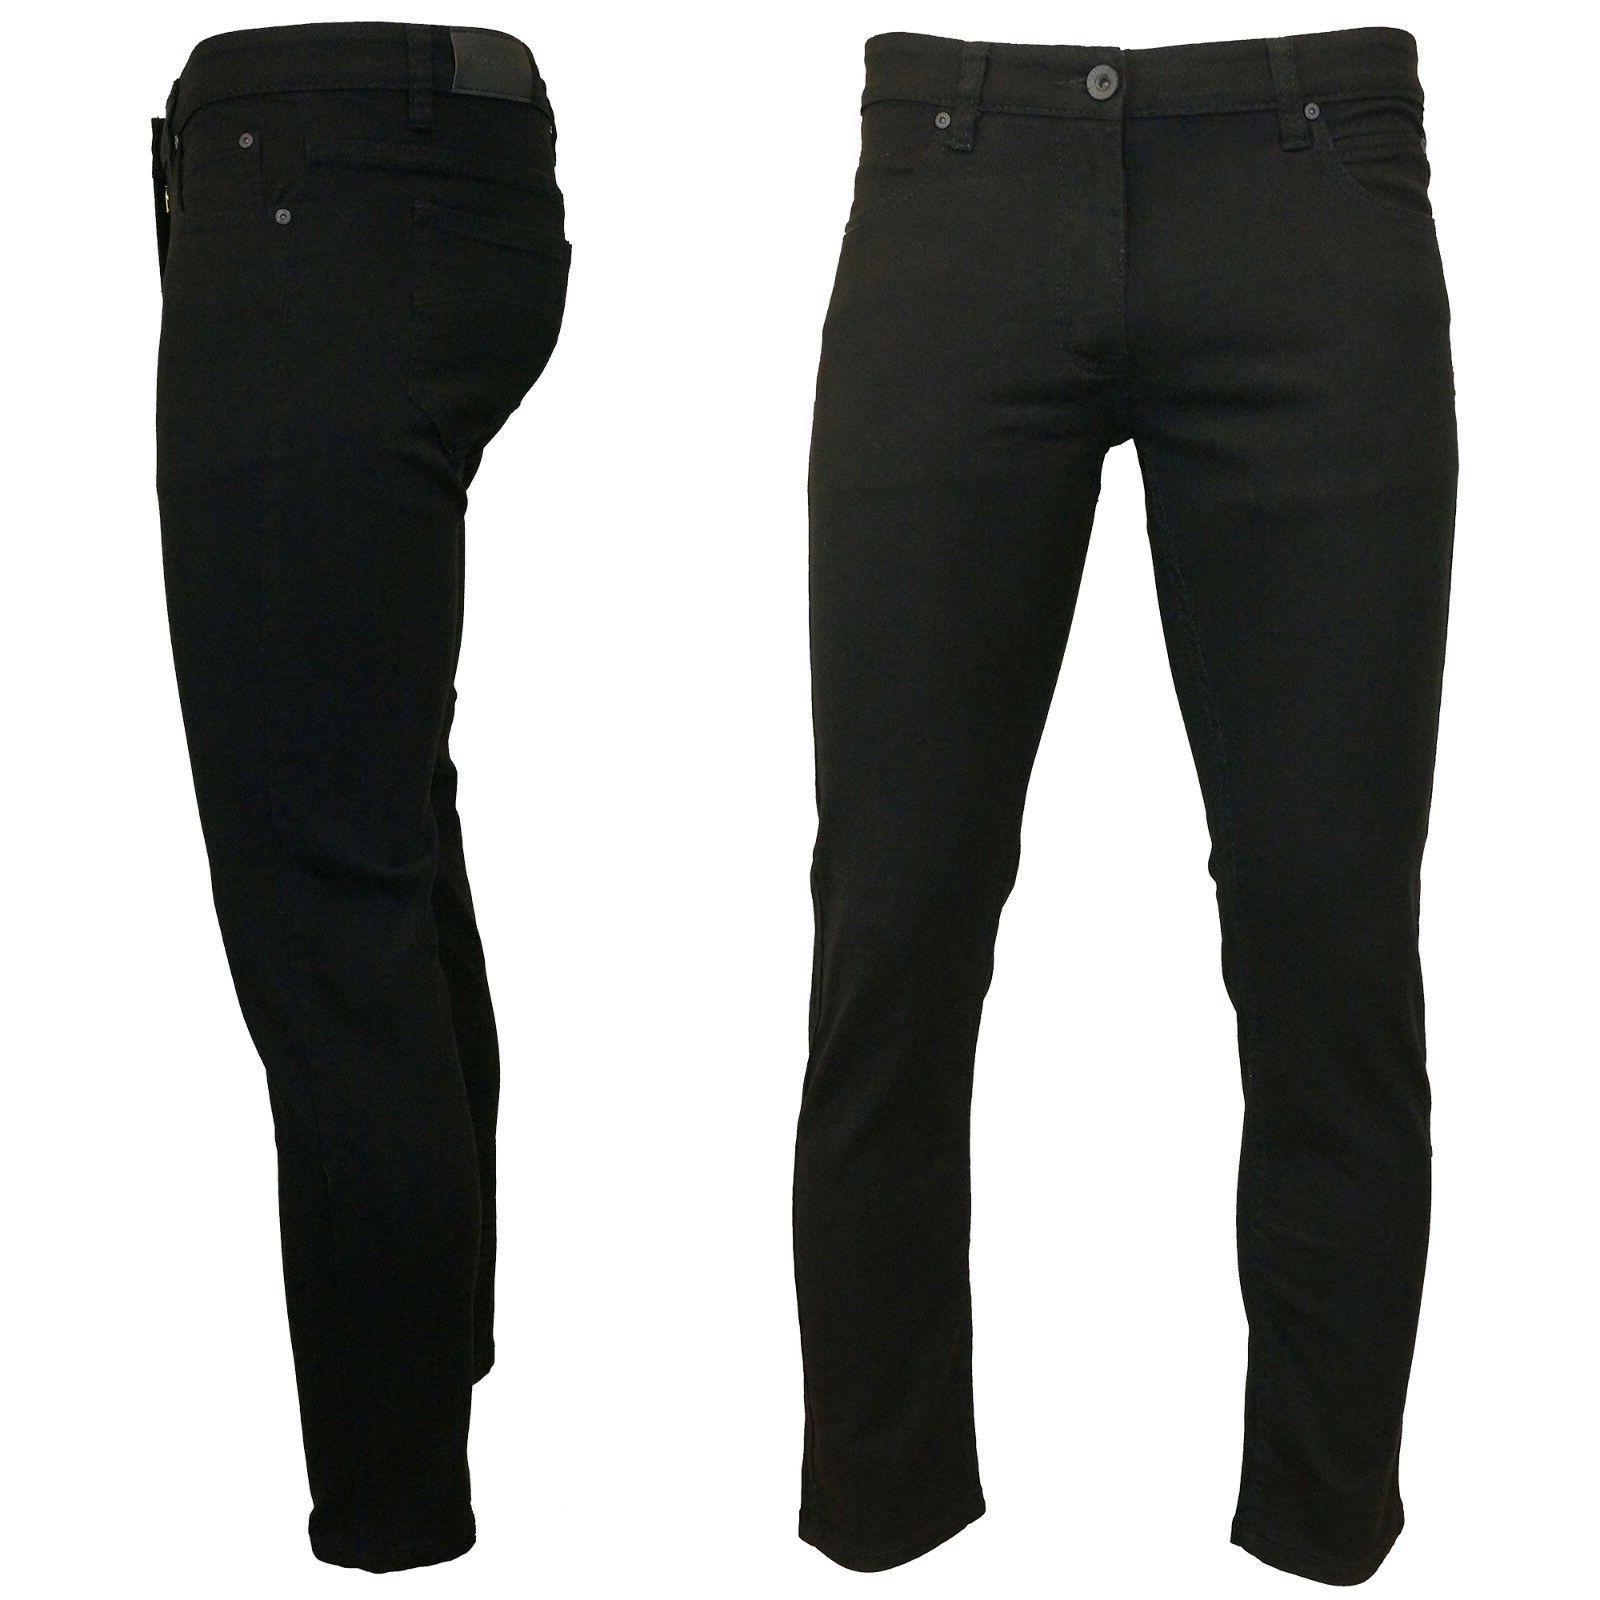 KAYDEN.K JET BLACK Men/'s Skinny Fit Stretch Twill Denim Jeans Pants Size 28-42